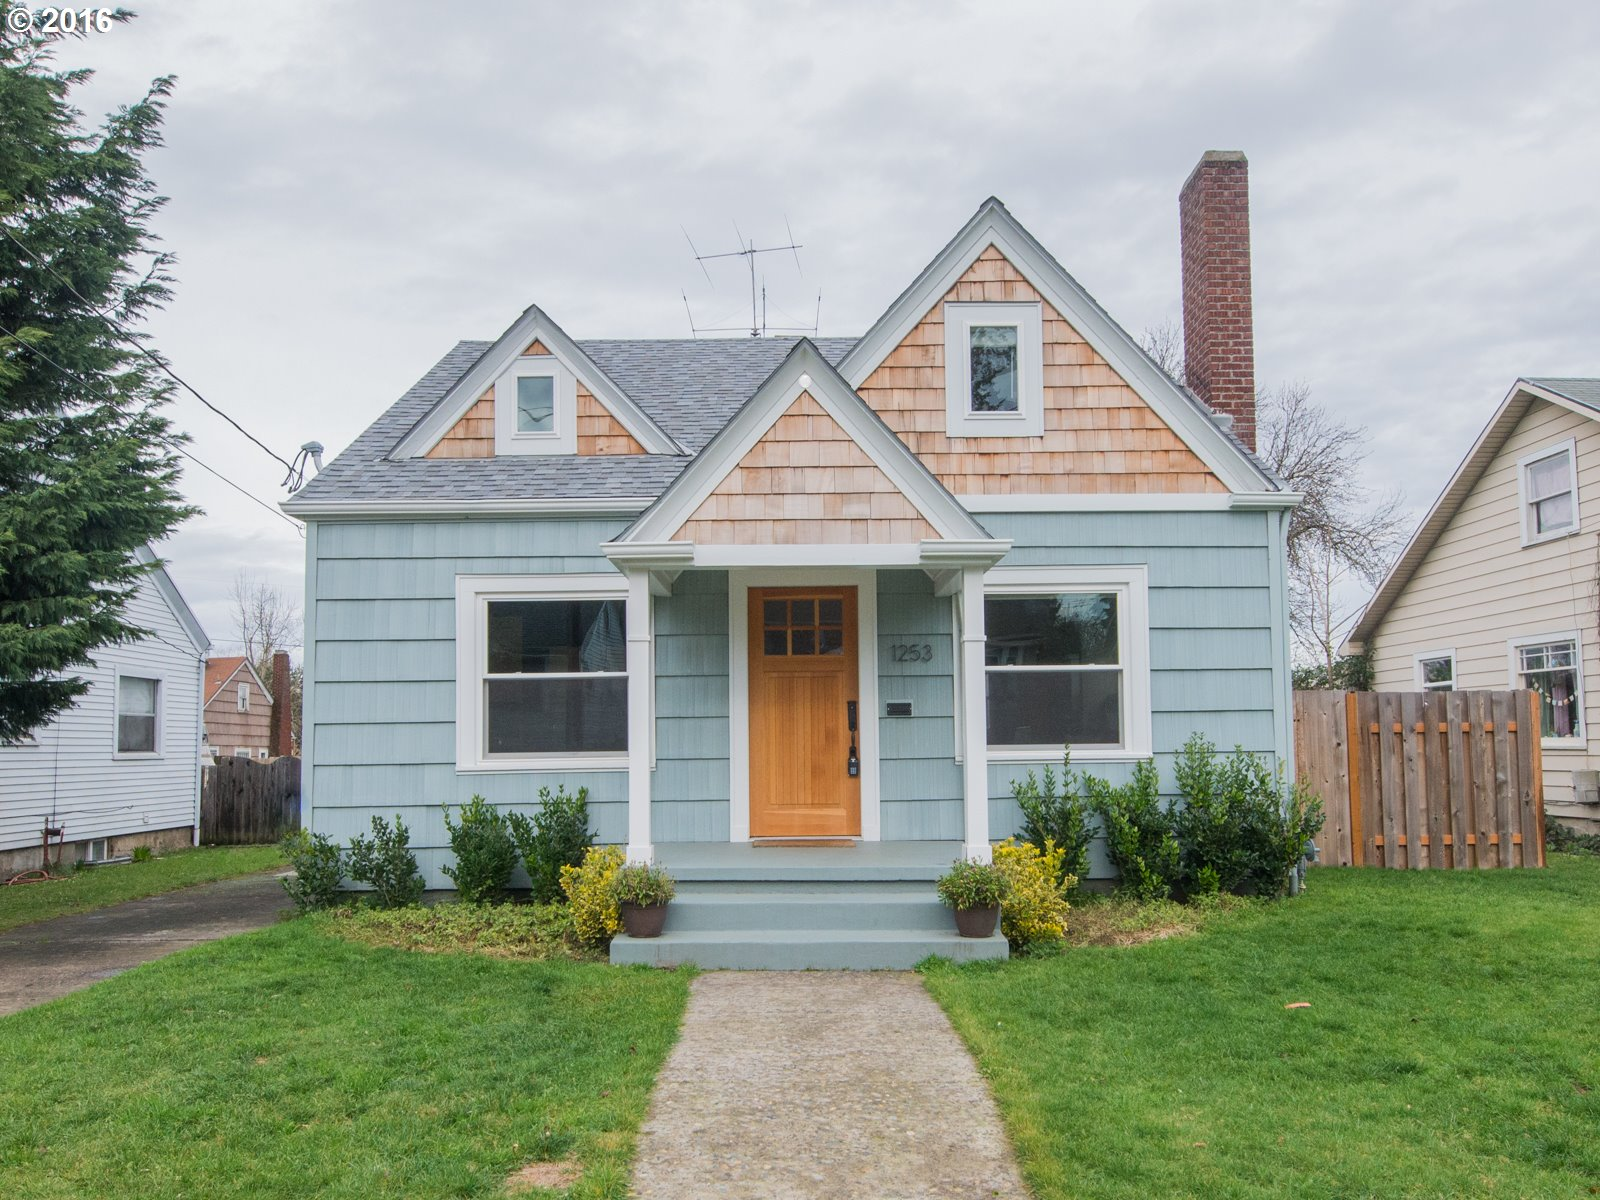 1253 N BALDWIN ST, Portland, OR 97217